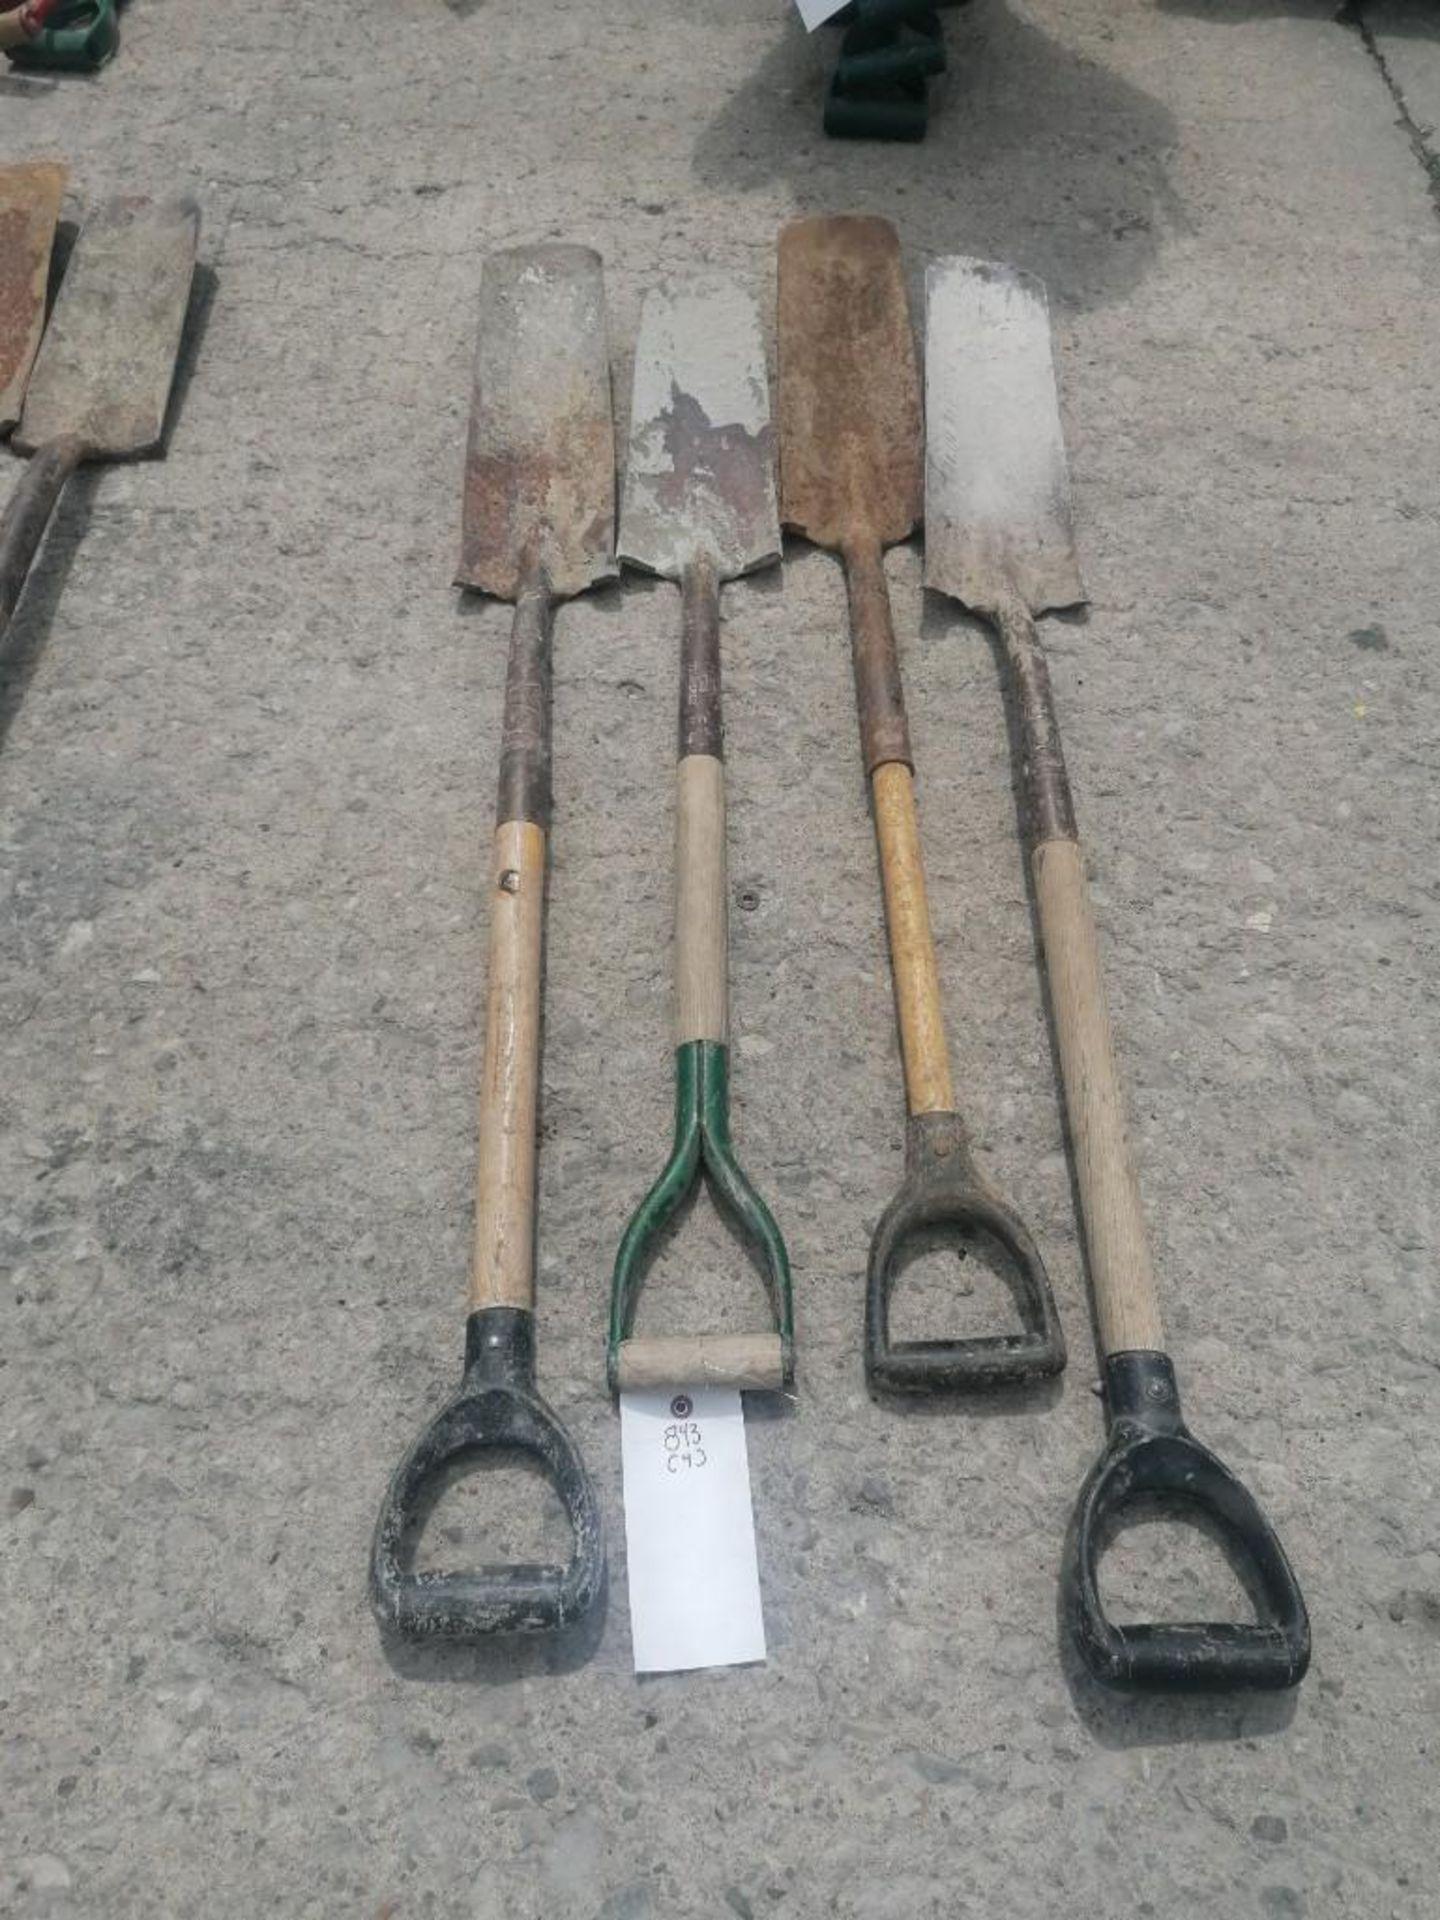 Lot 58 - (4) Shovels. Located at 301 E Henry Street, Mt. Pleasant, IA 52641.